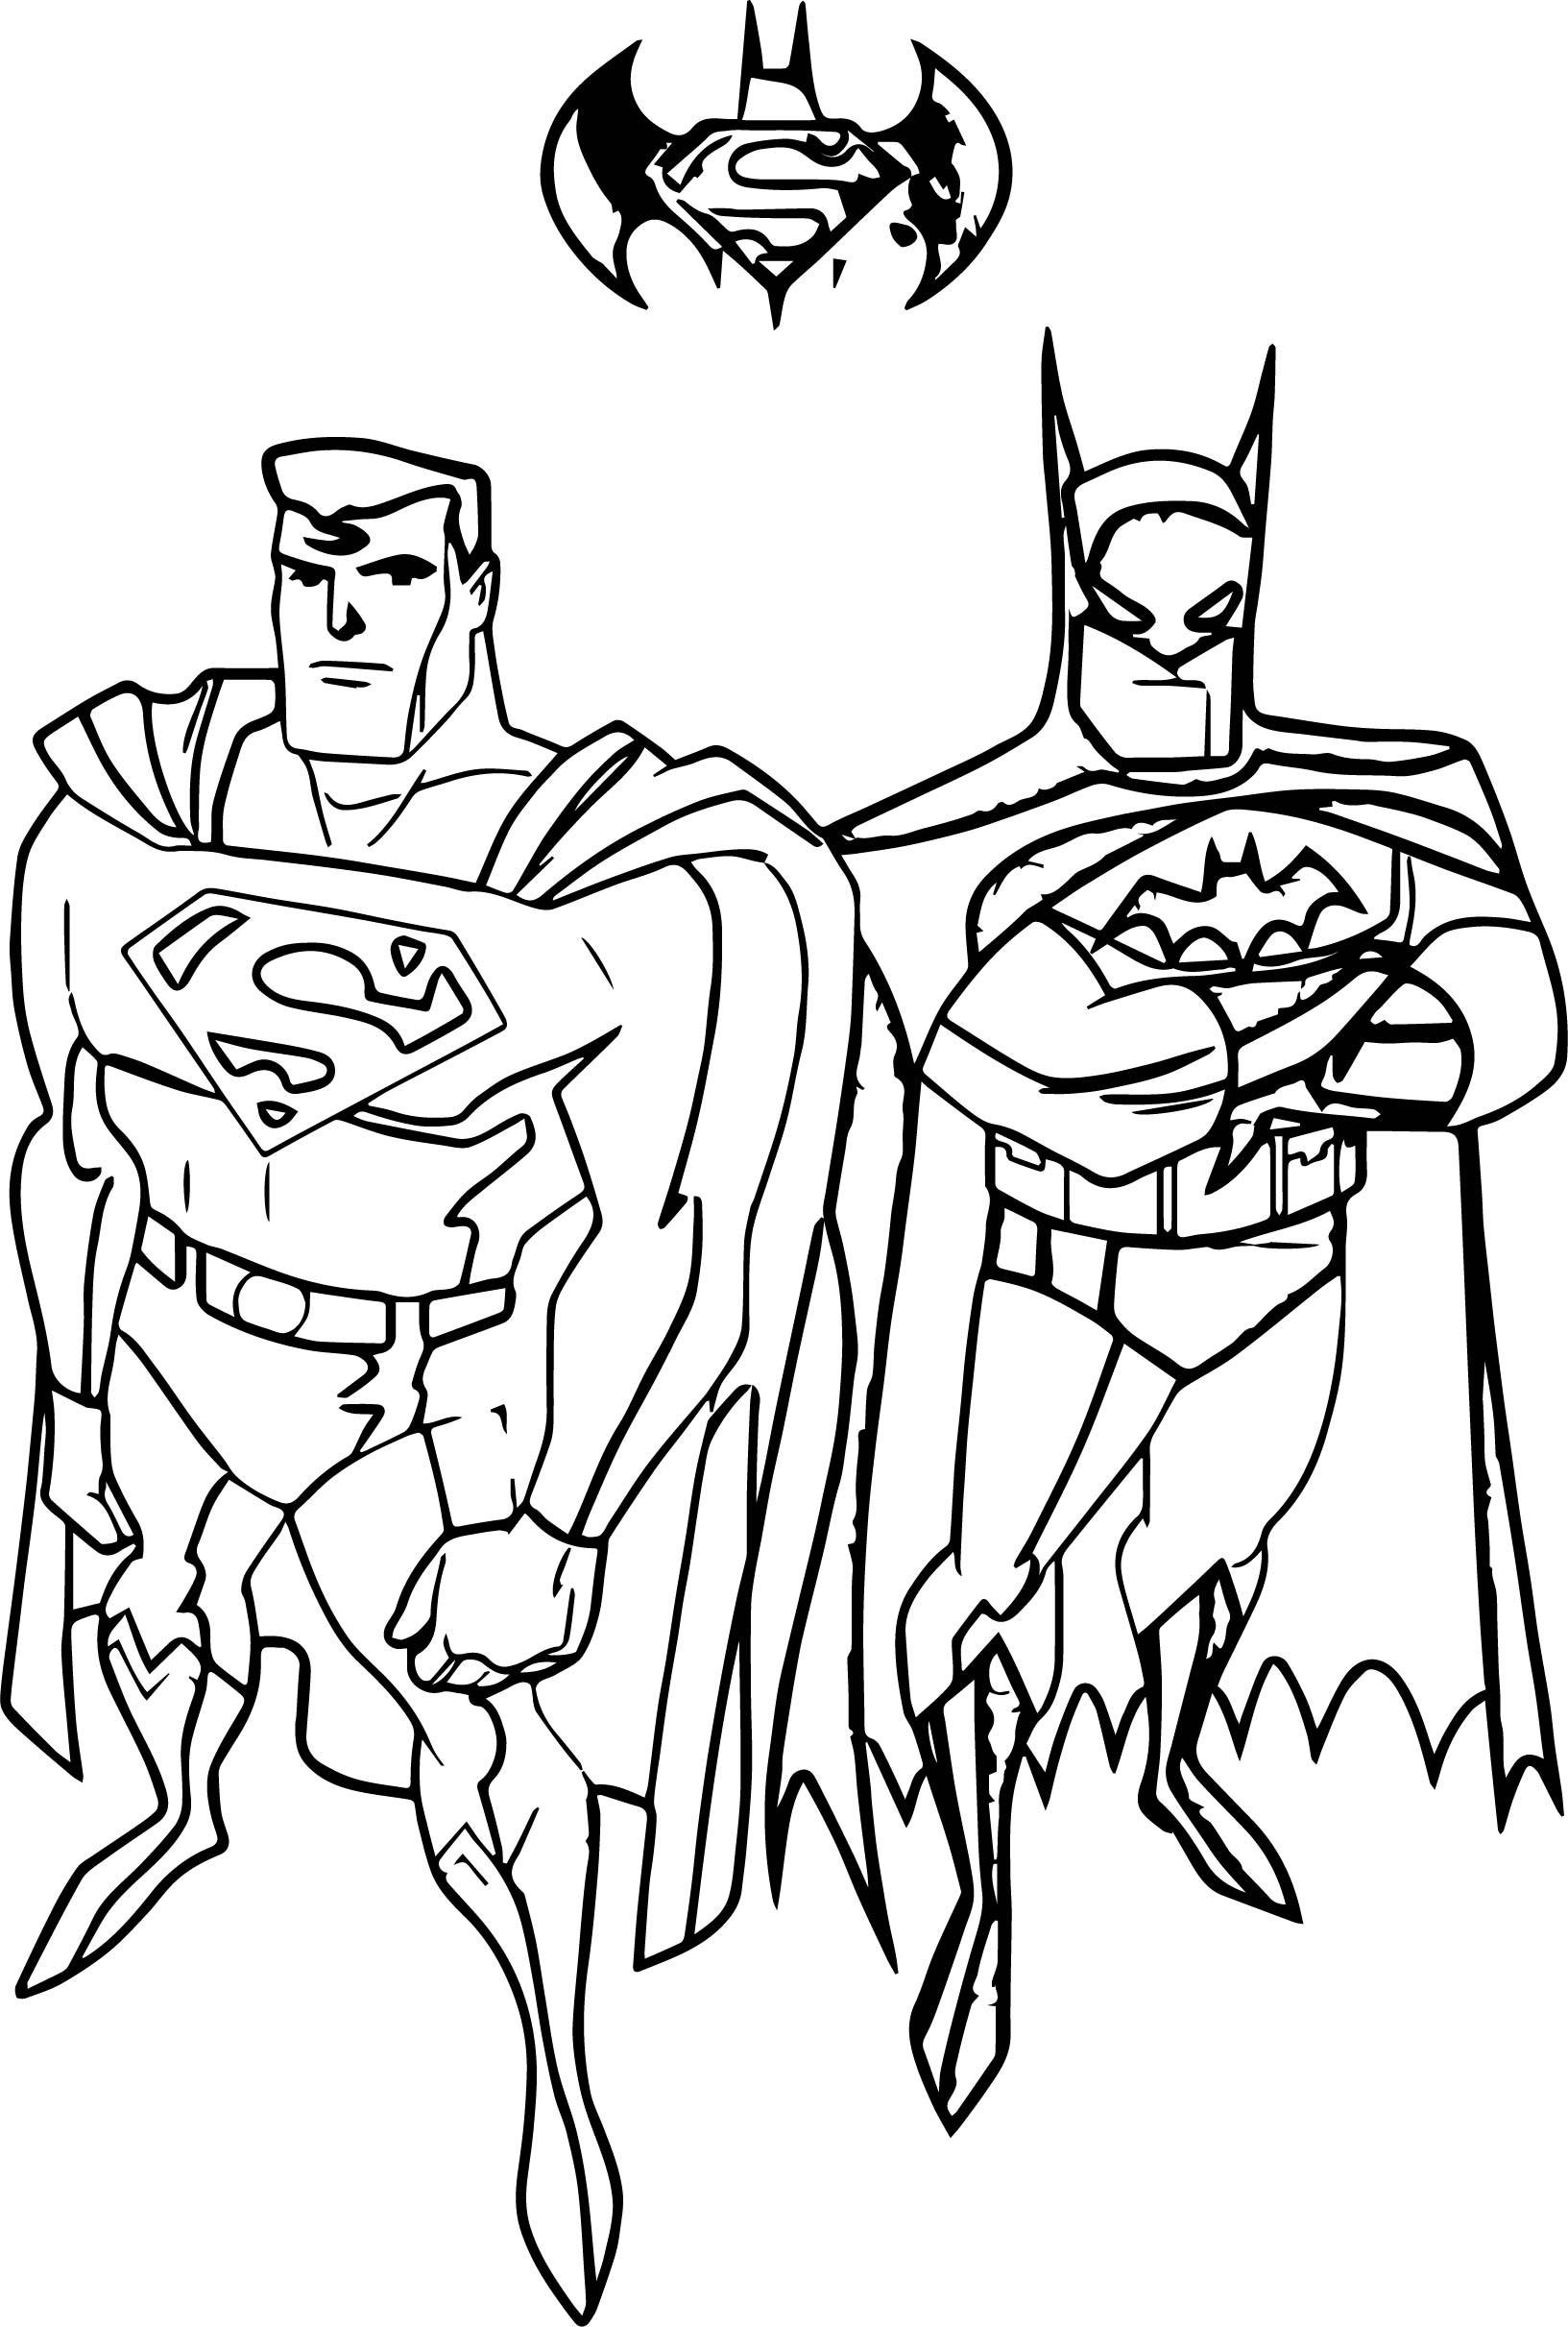 1633x2423 Baby Superman Coloring Pages Fresh Batman Vs Superman Coloring